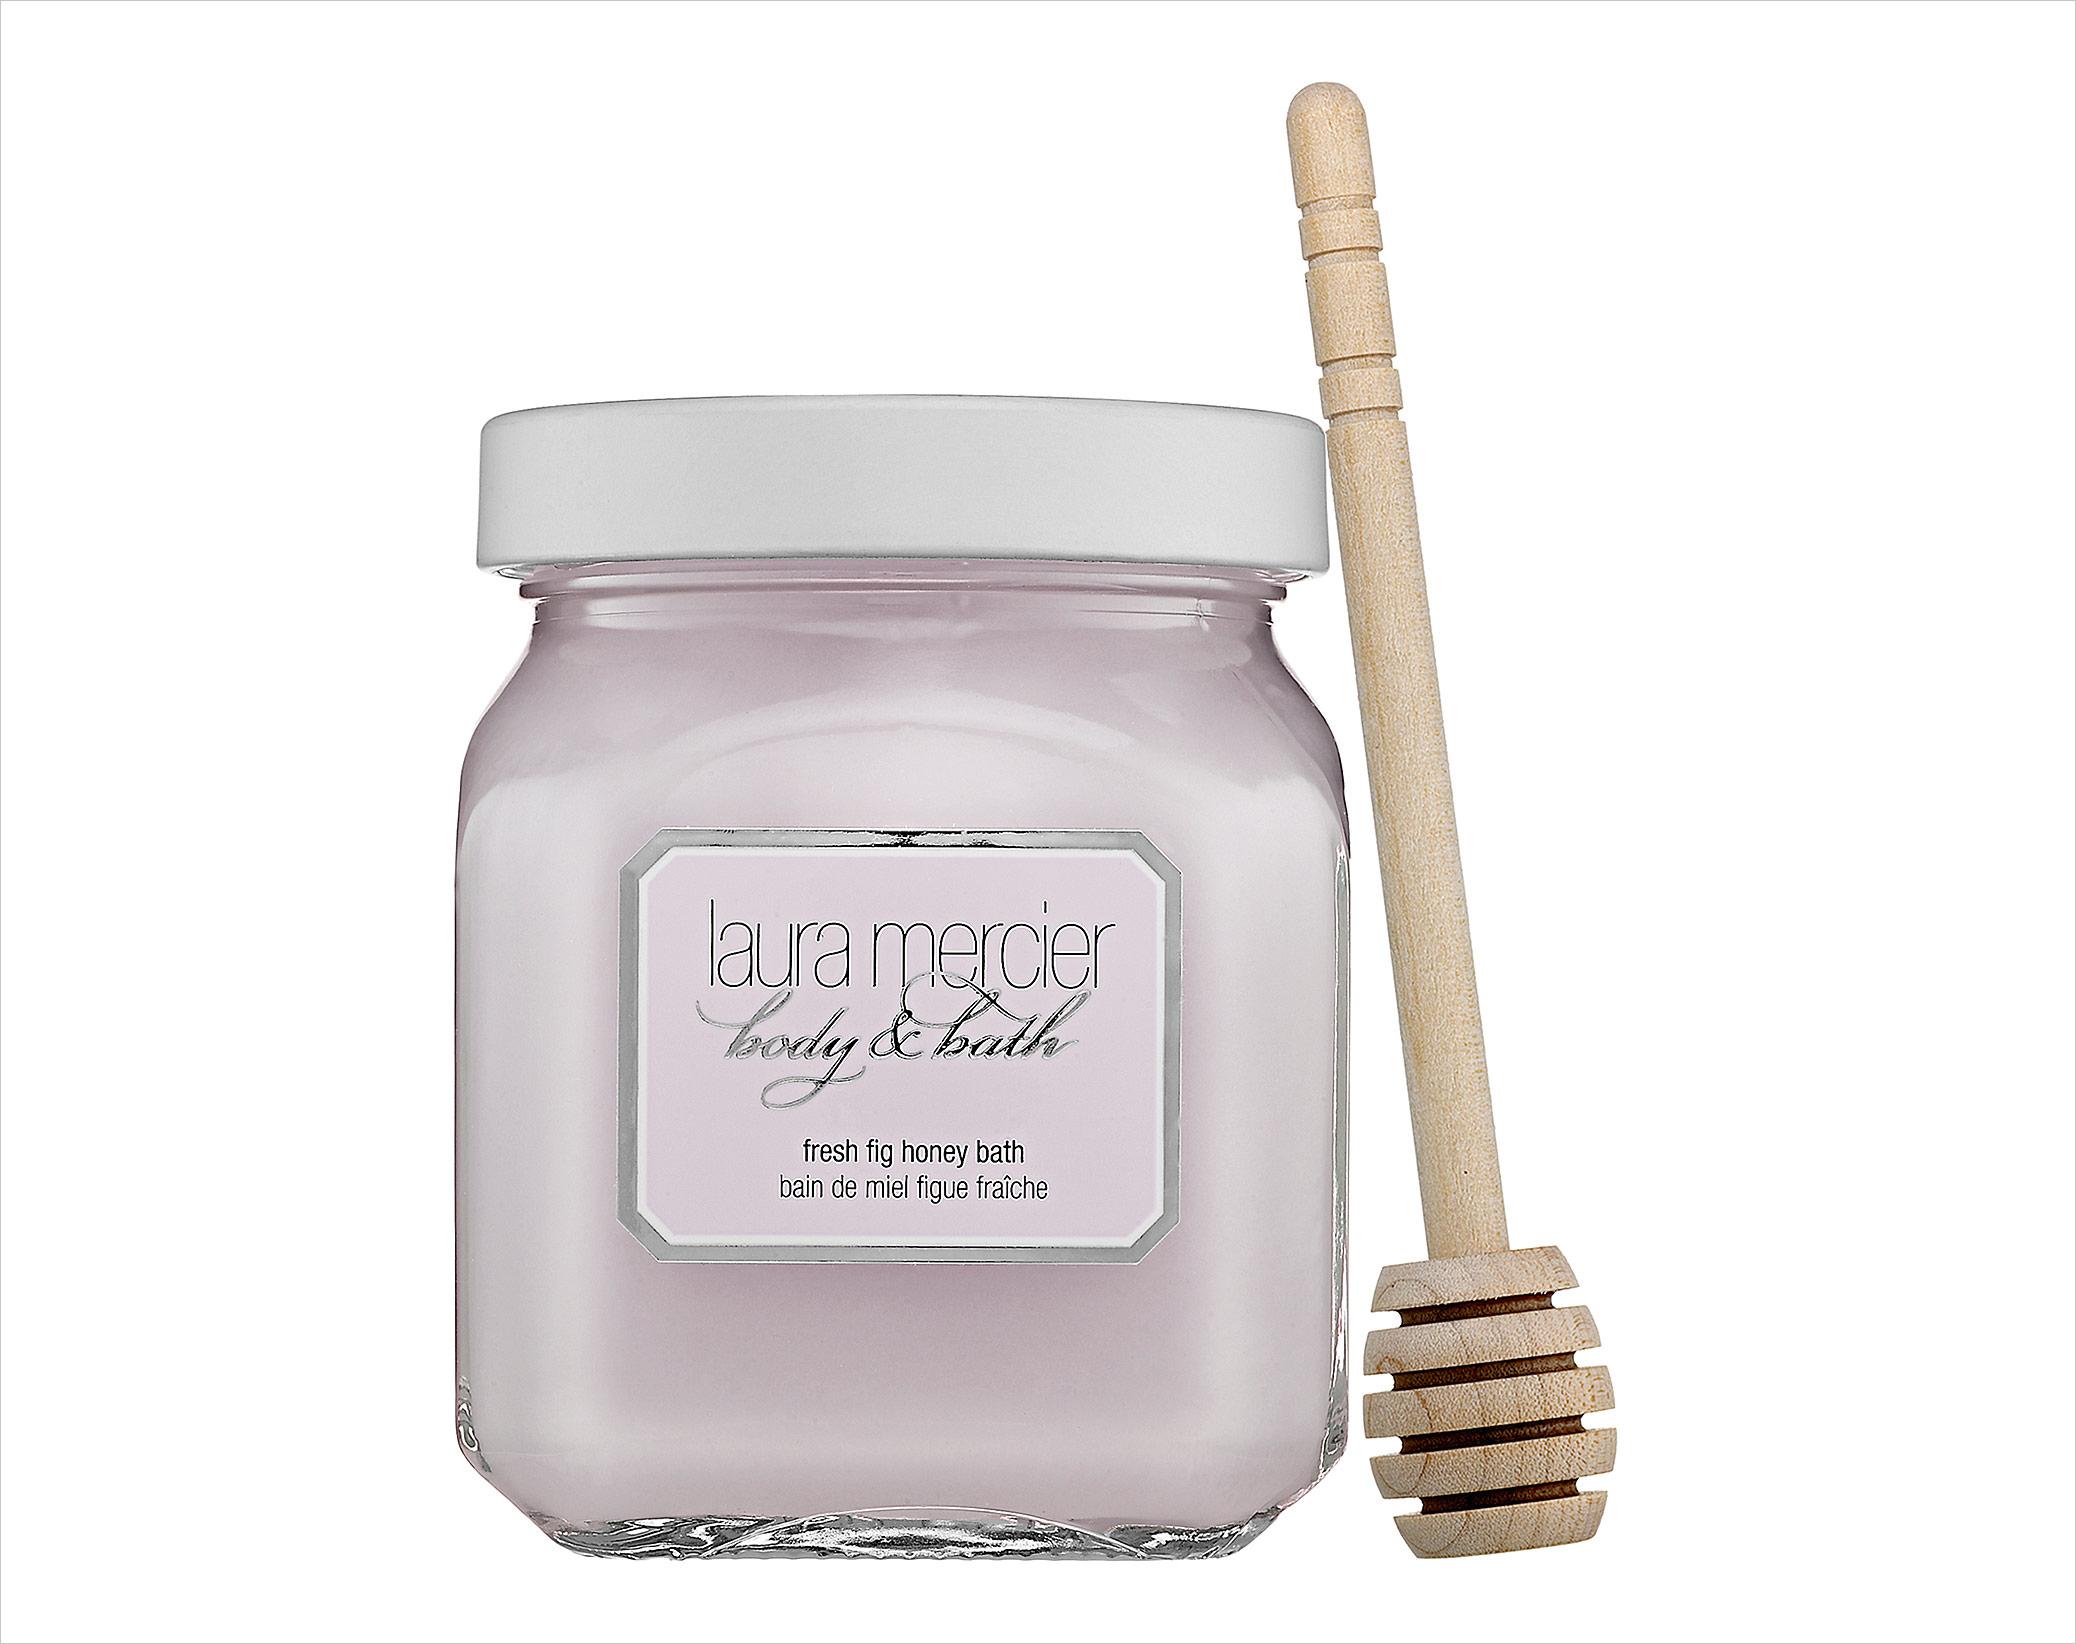 Fresh fig honey bath Laura Mercier bubble bath bridal relaxation tips and products